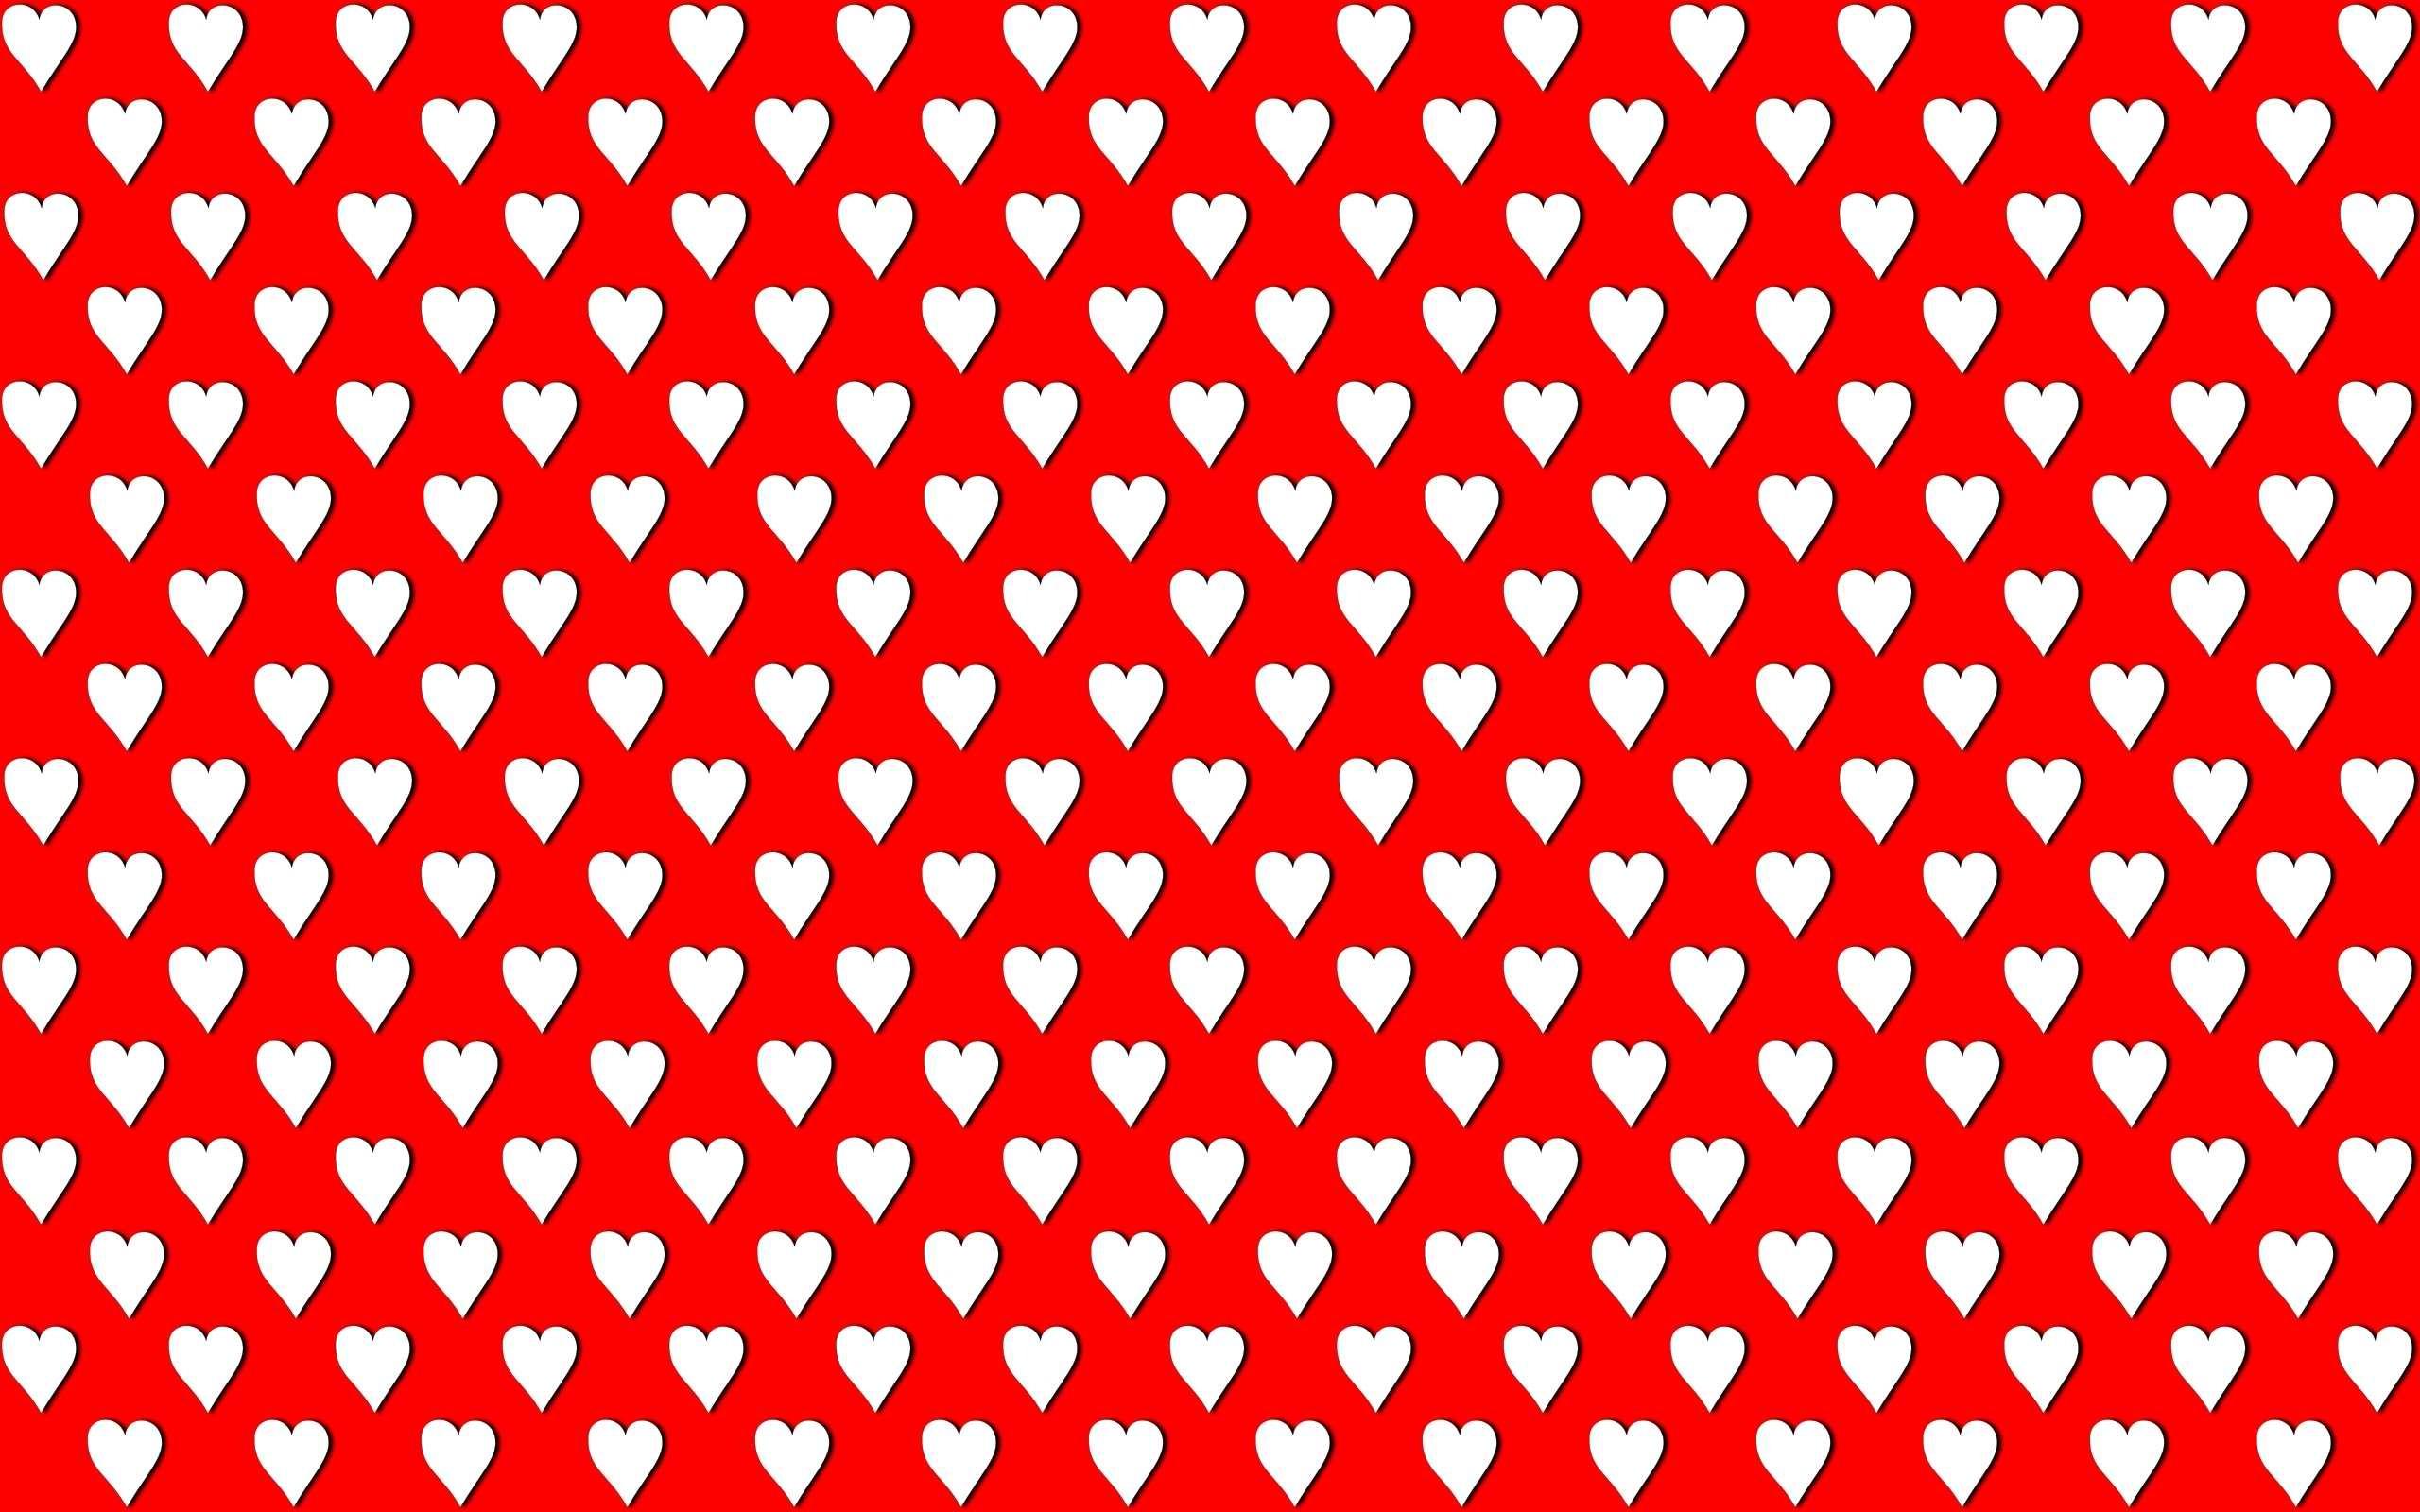 Polka Dot Wallpapers (51+ images)